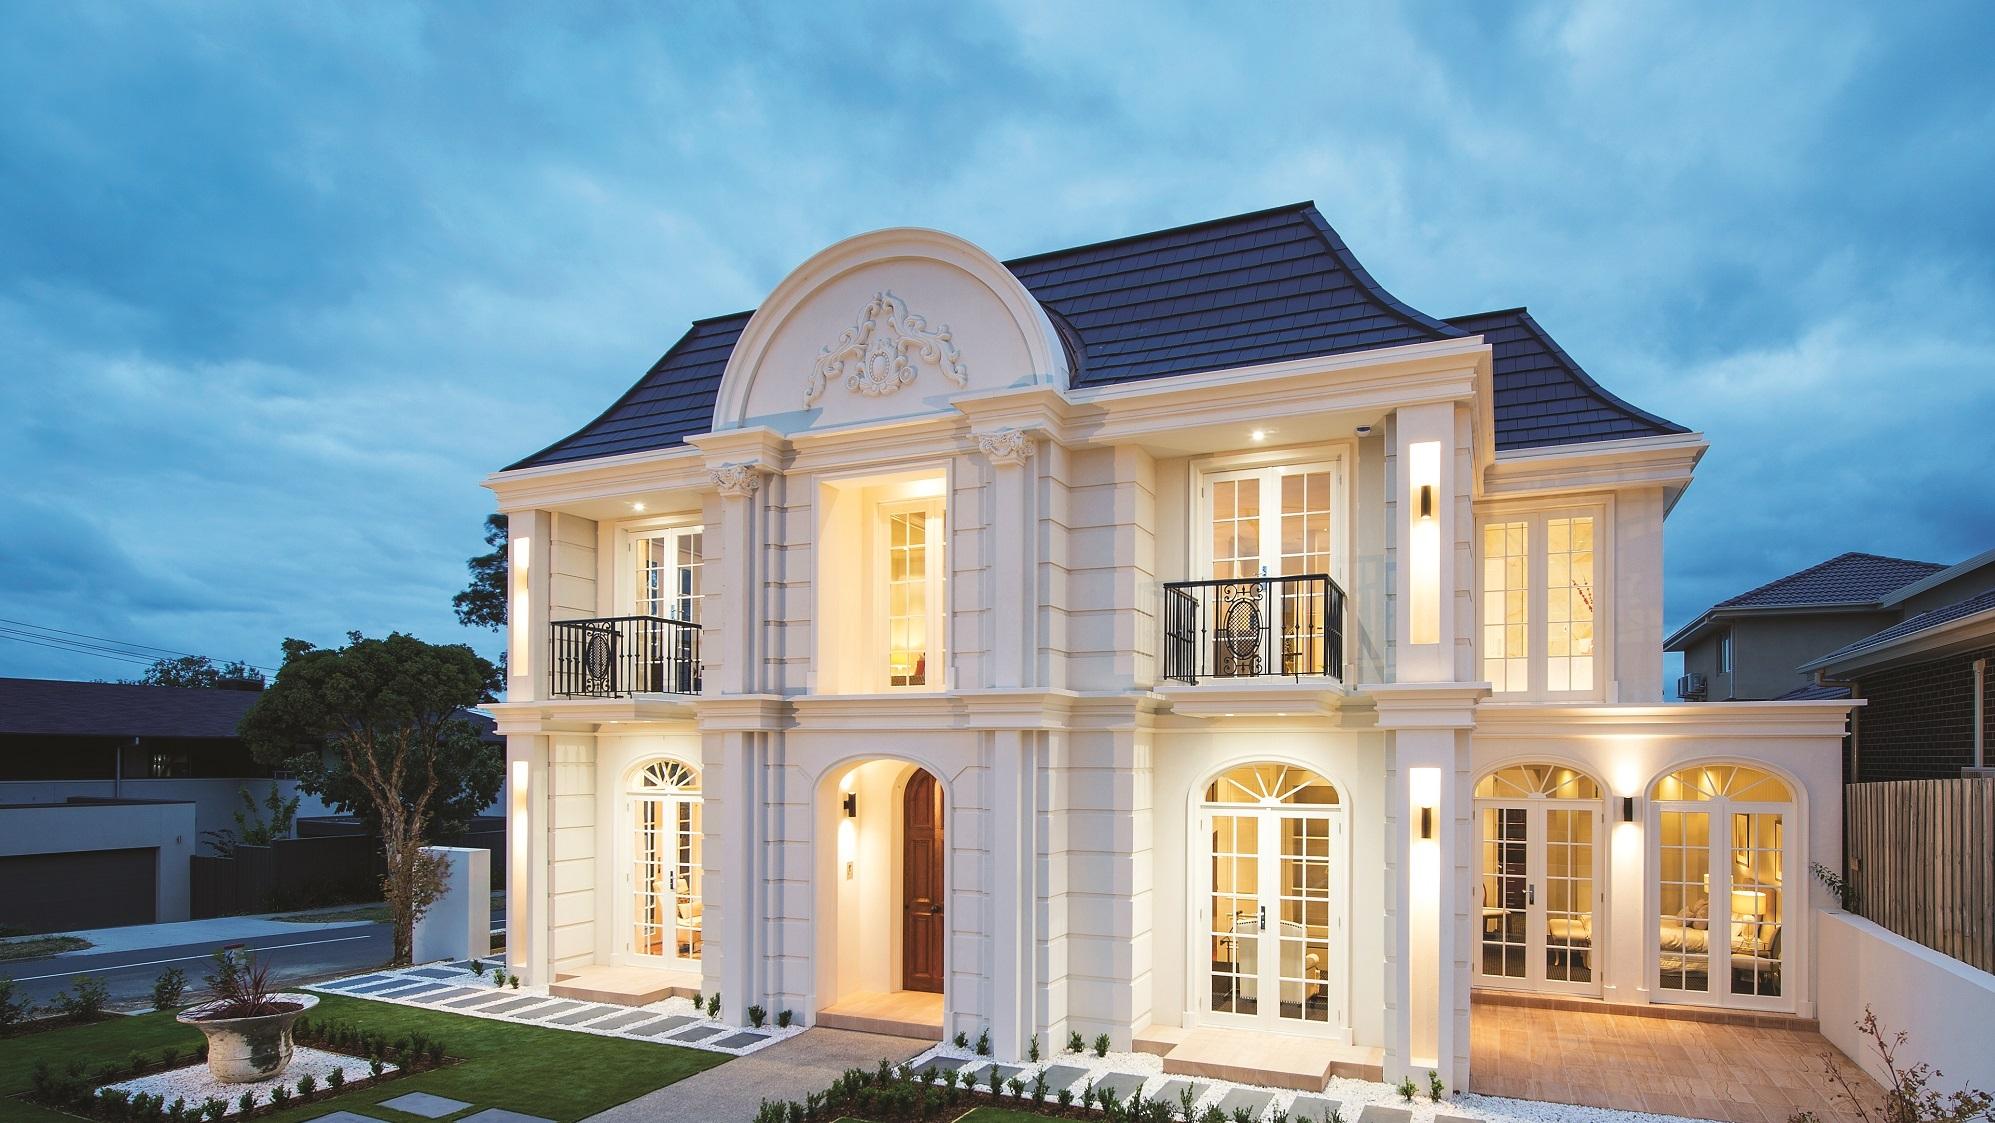 European style custom homes melbourne melbourne custom homes for European style home builders